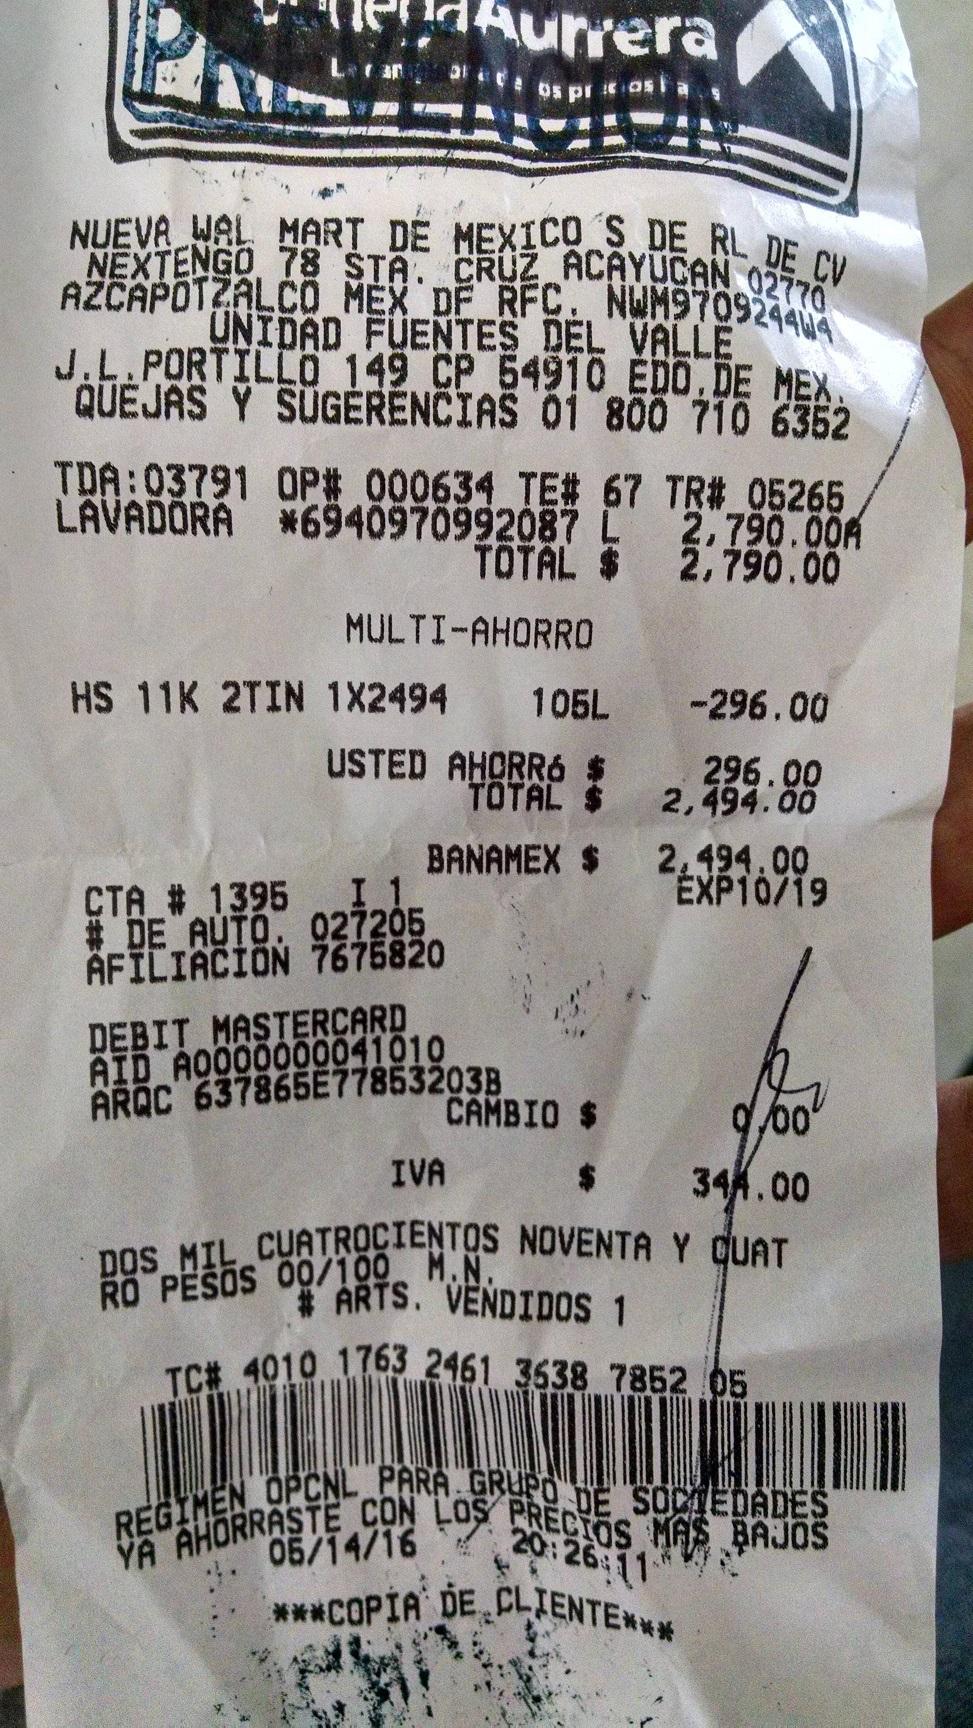 Bodega Aurrerá: Lavadora Hisense 11Kg a $2,494